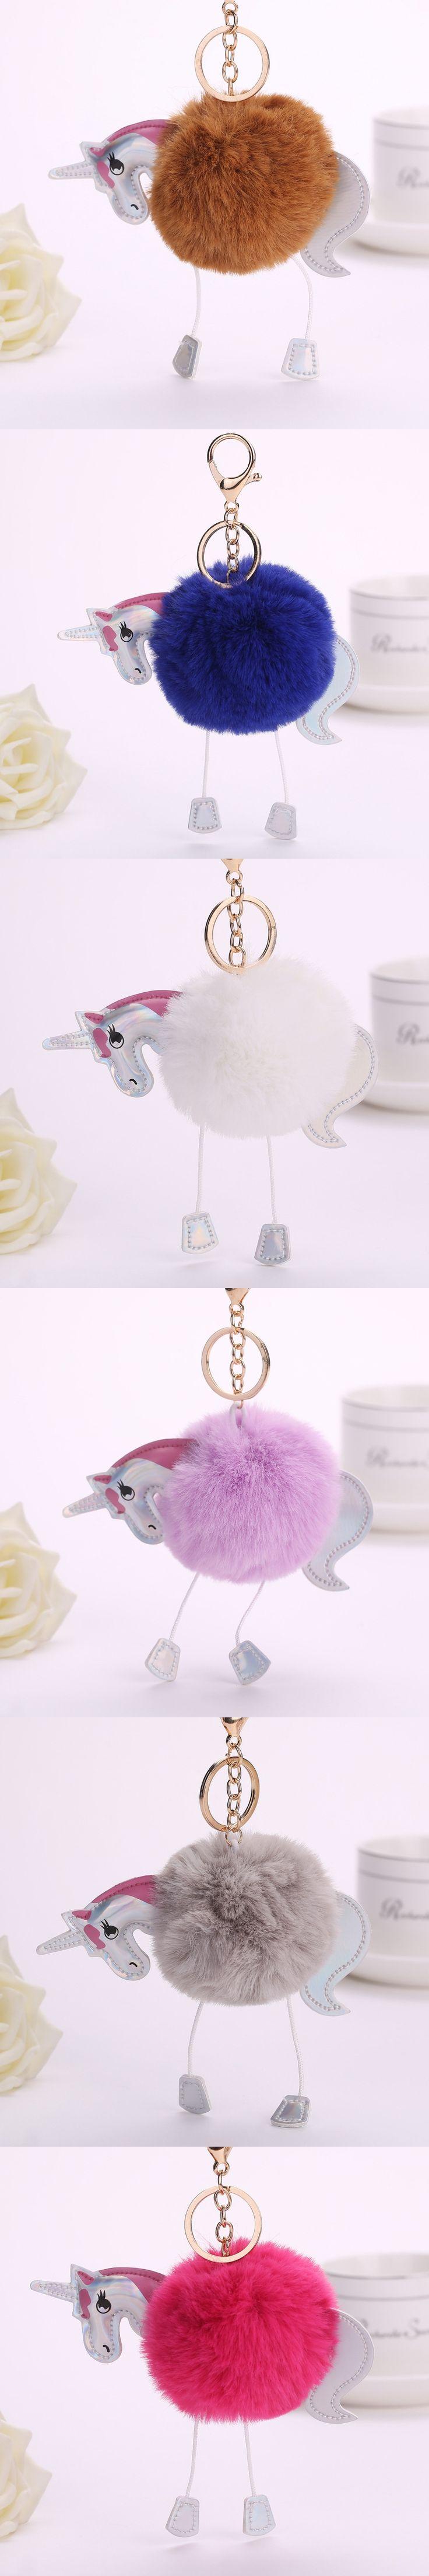 2017 New Selling Unicorn Plush Horse Hammer Ball Cartoon PU Fur Ball Keychain Bag Key Pendant Ladies Men Jewelry Holiday Gift